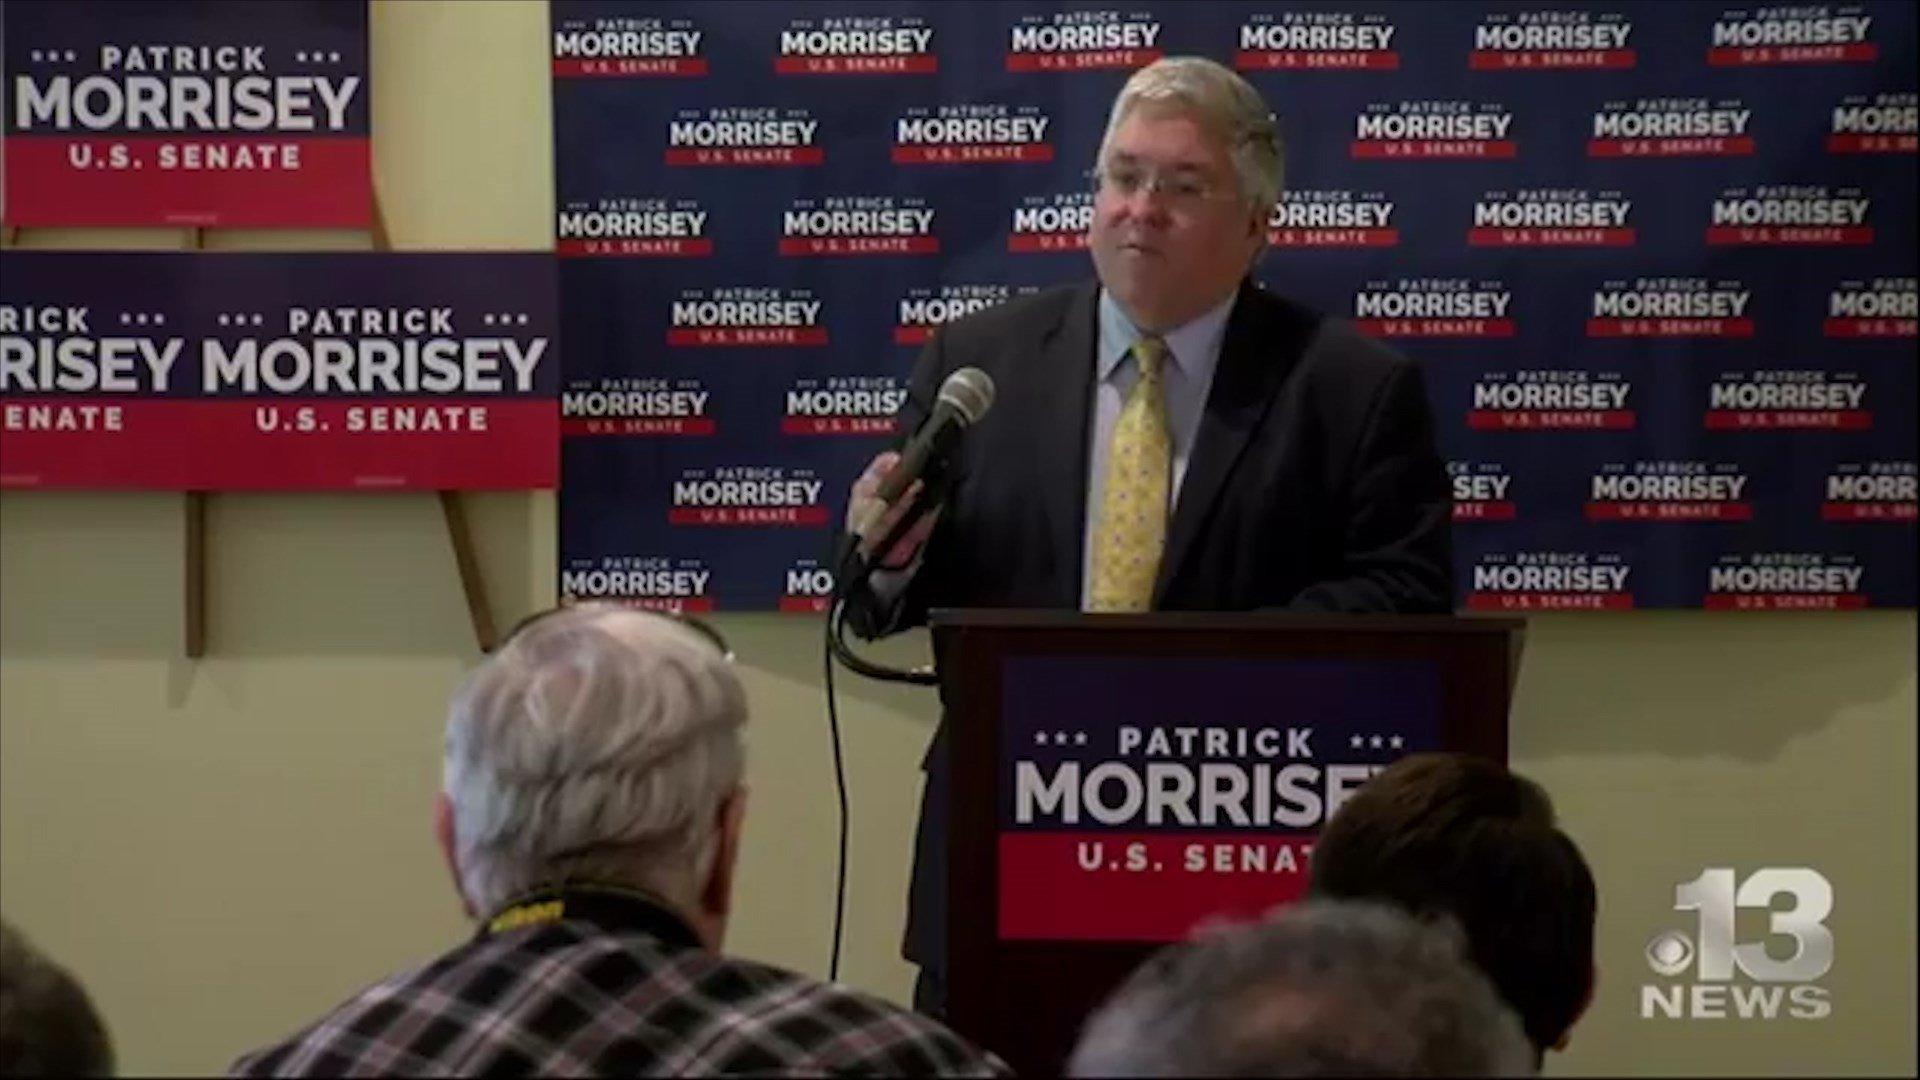 WV Attorney General Patrick Morrisey is running for U.S. Senate